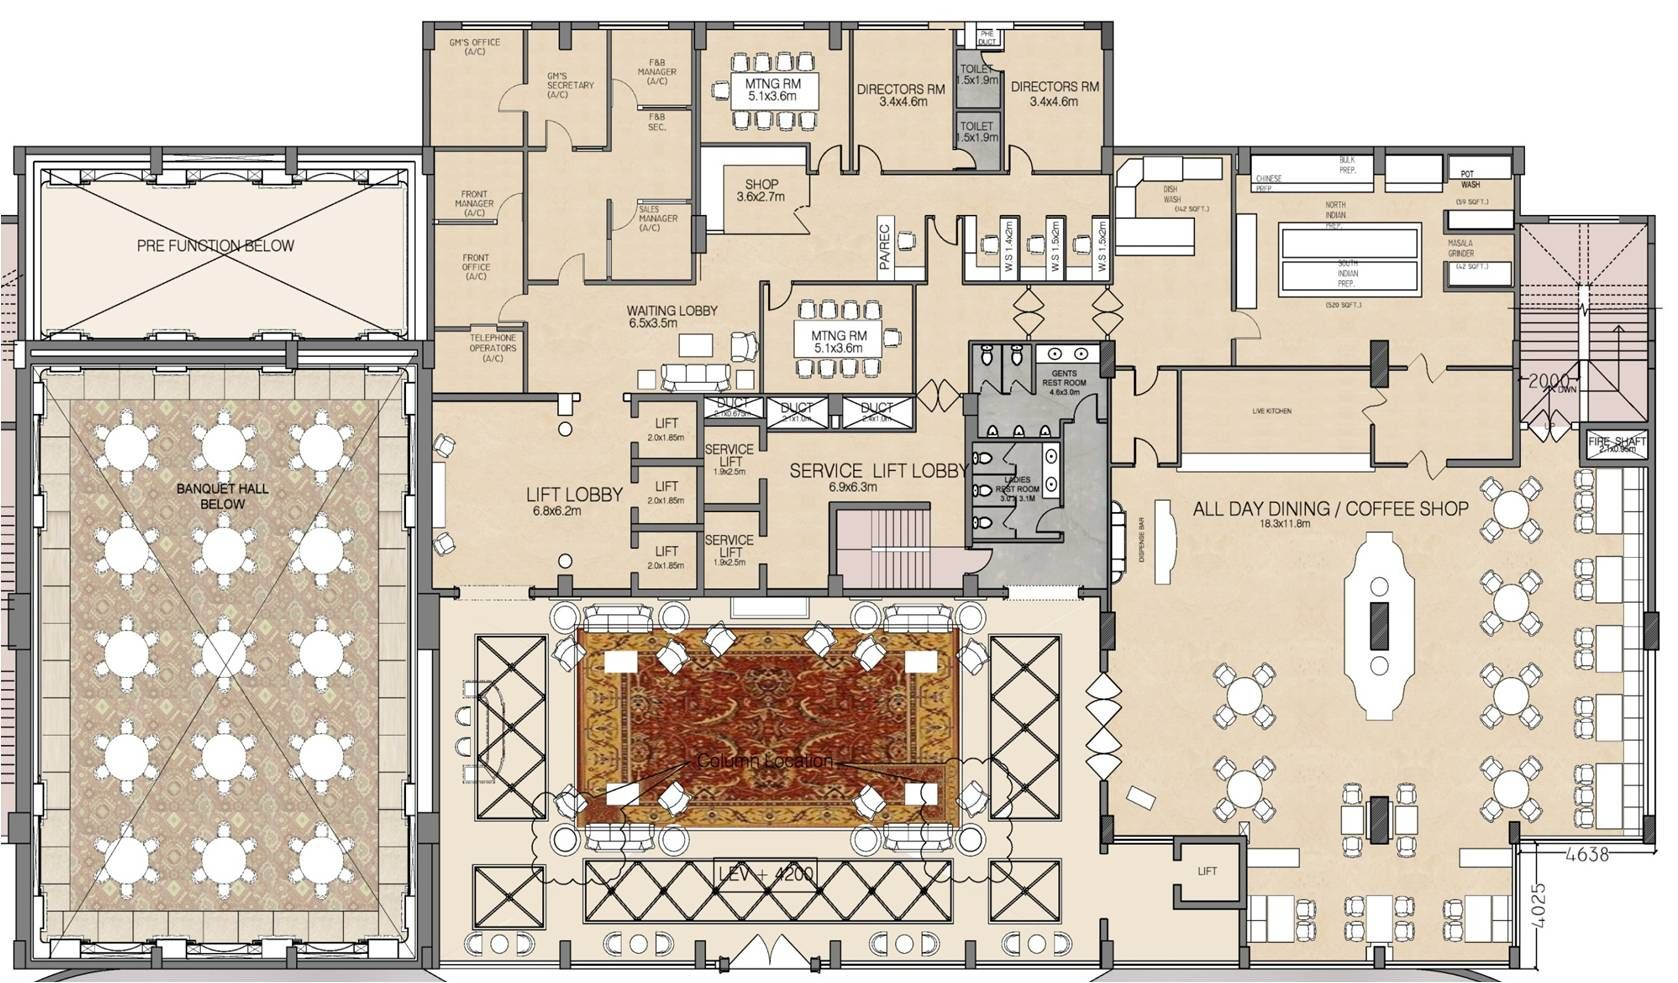 Hotel Restaurant Floor Plan - Google Search